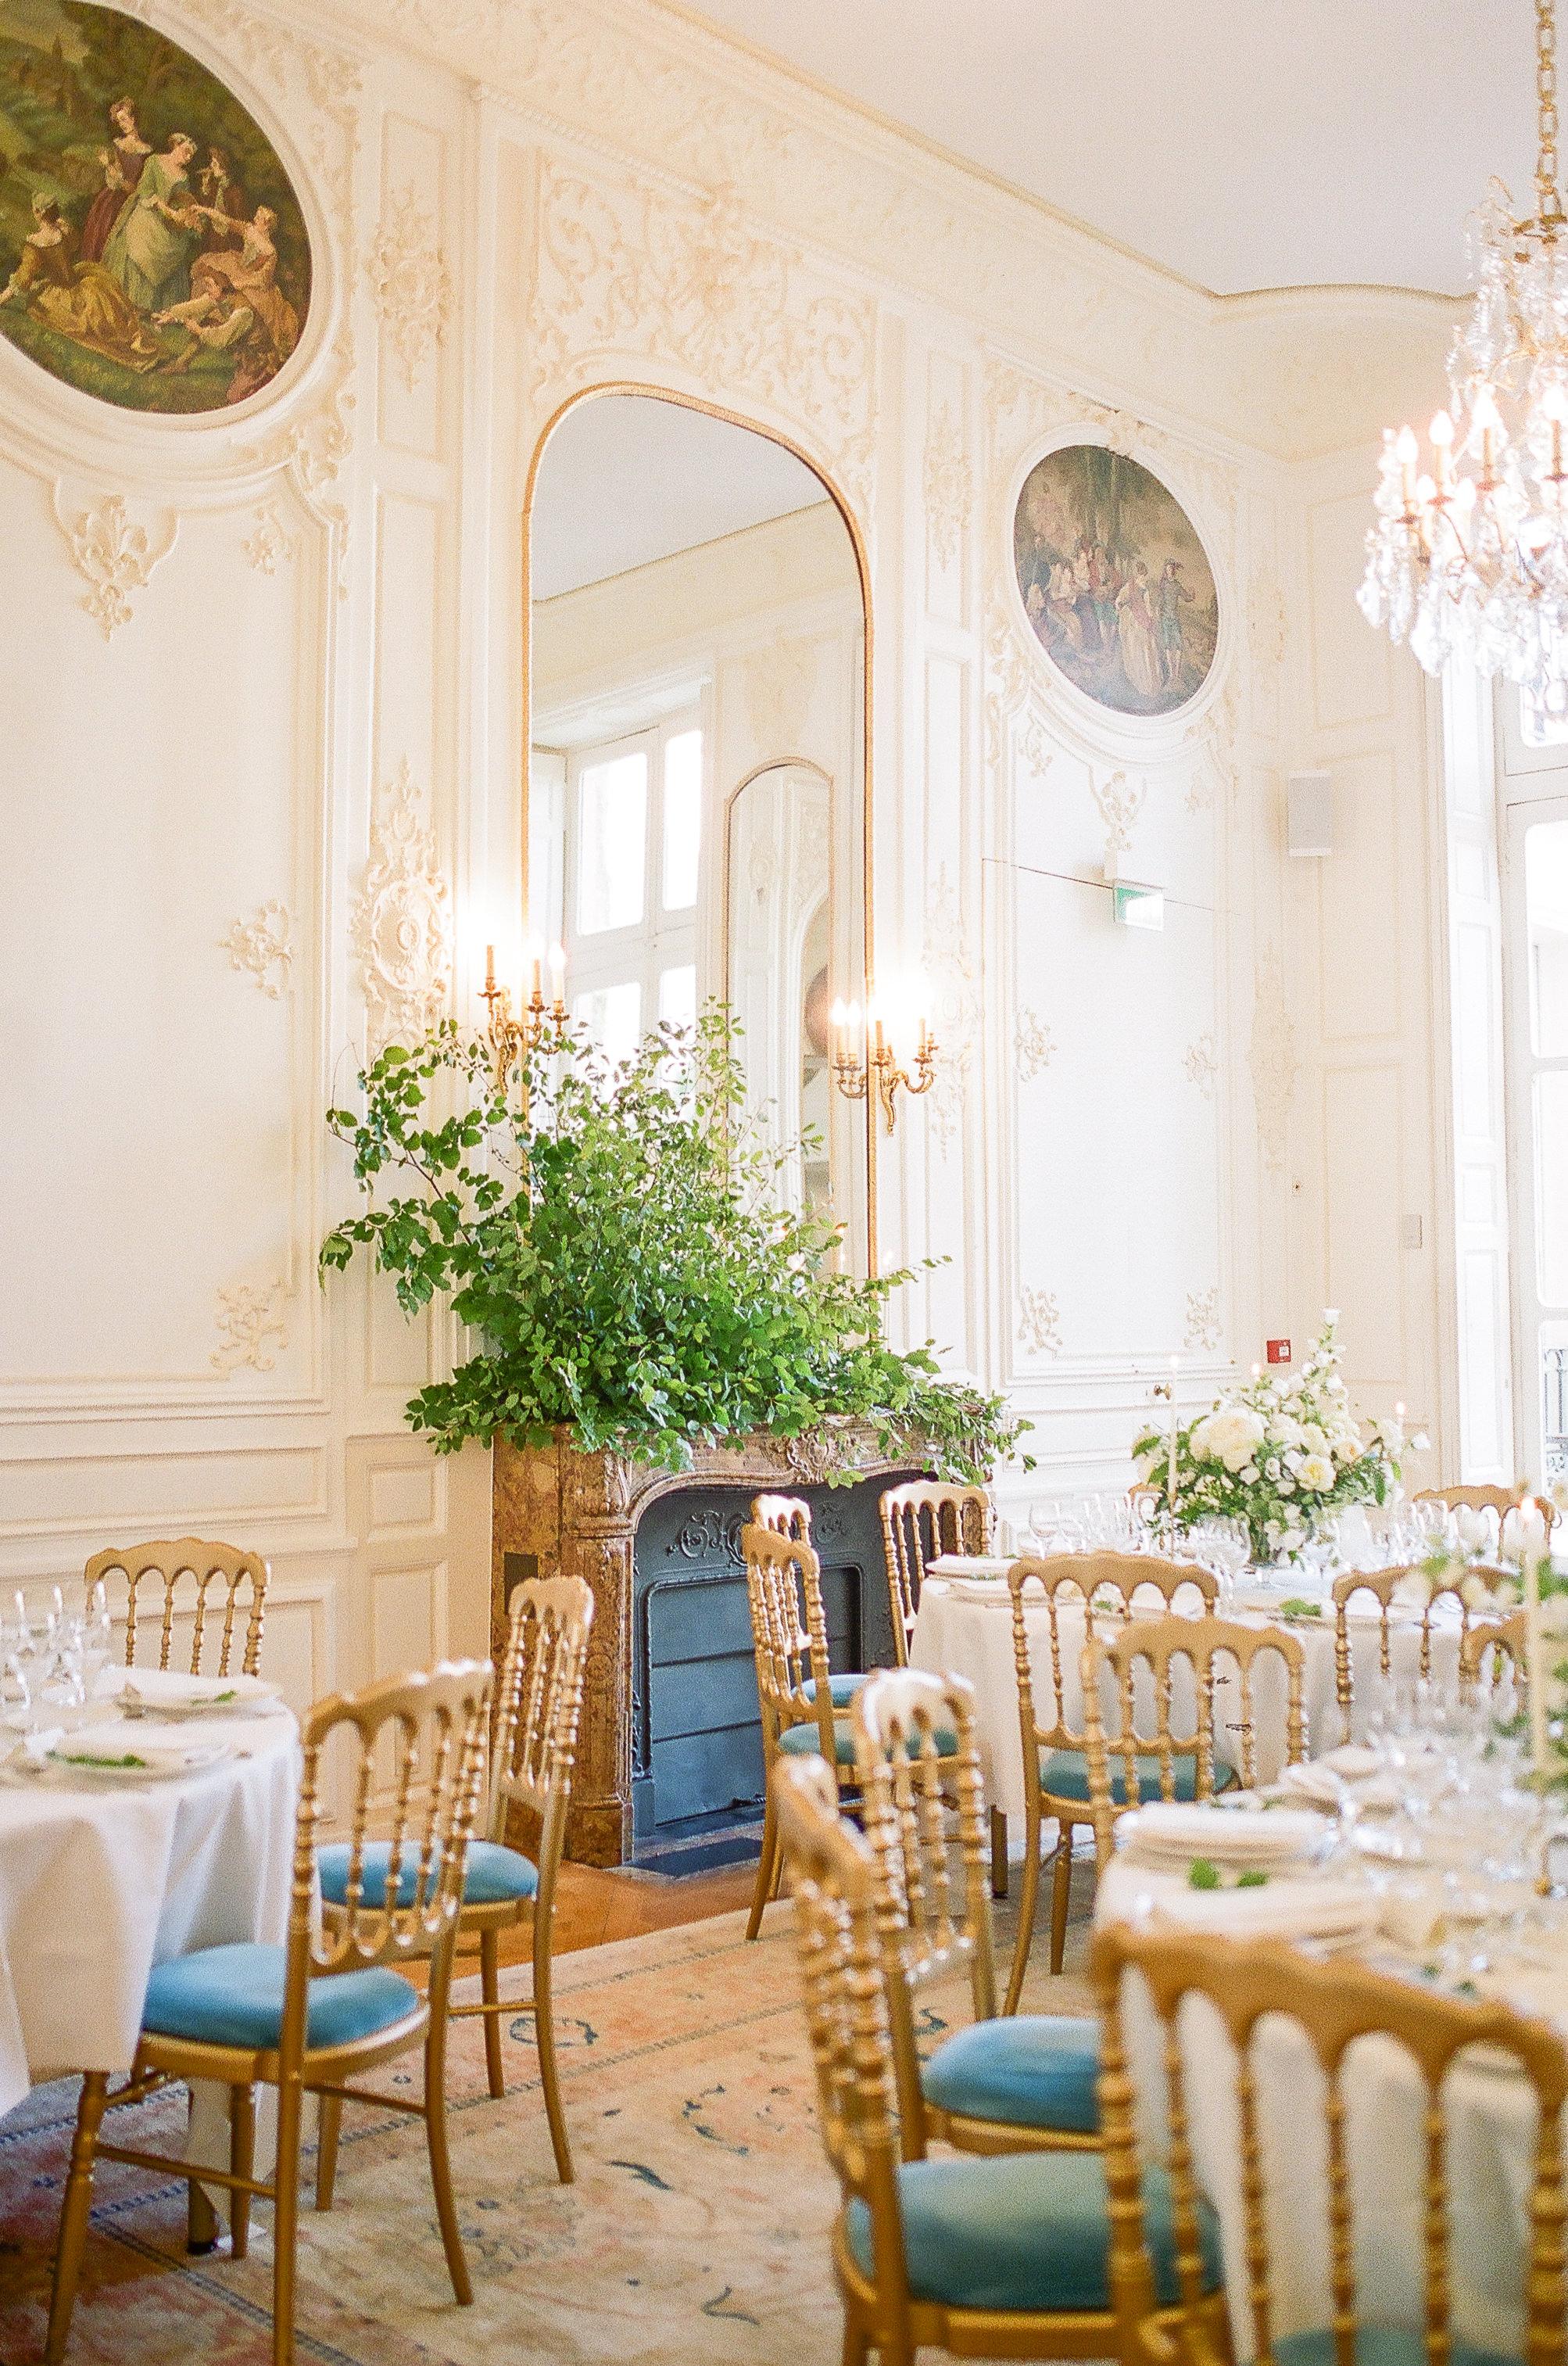 maison-de-polytechniciens-wedding-flowers-peonies-garden-roses-and-paris-wedding-florist.jpg